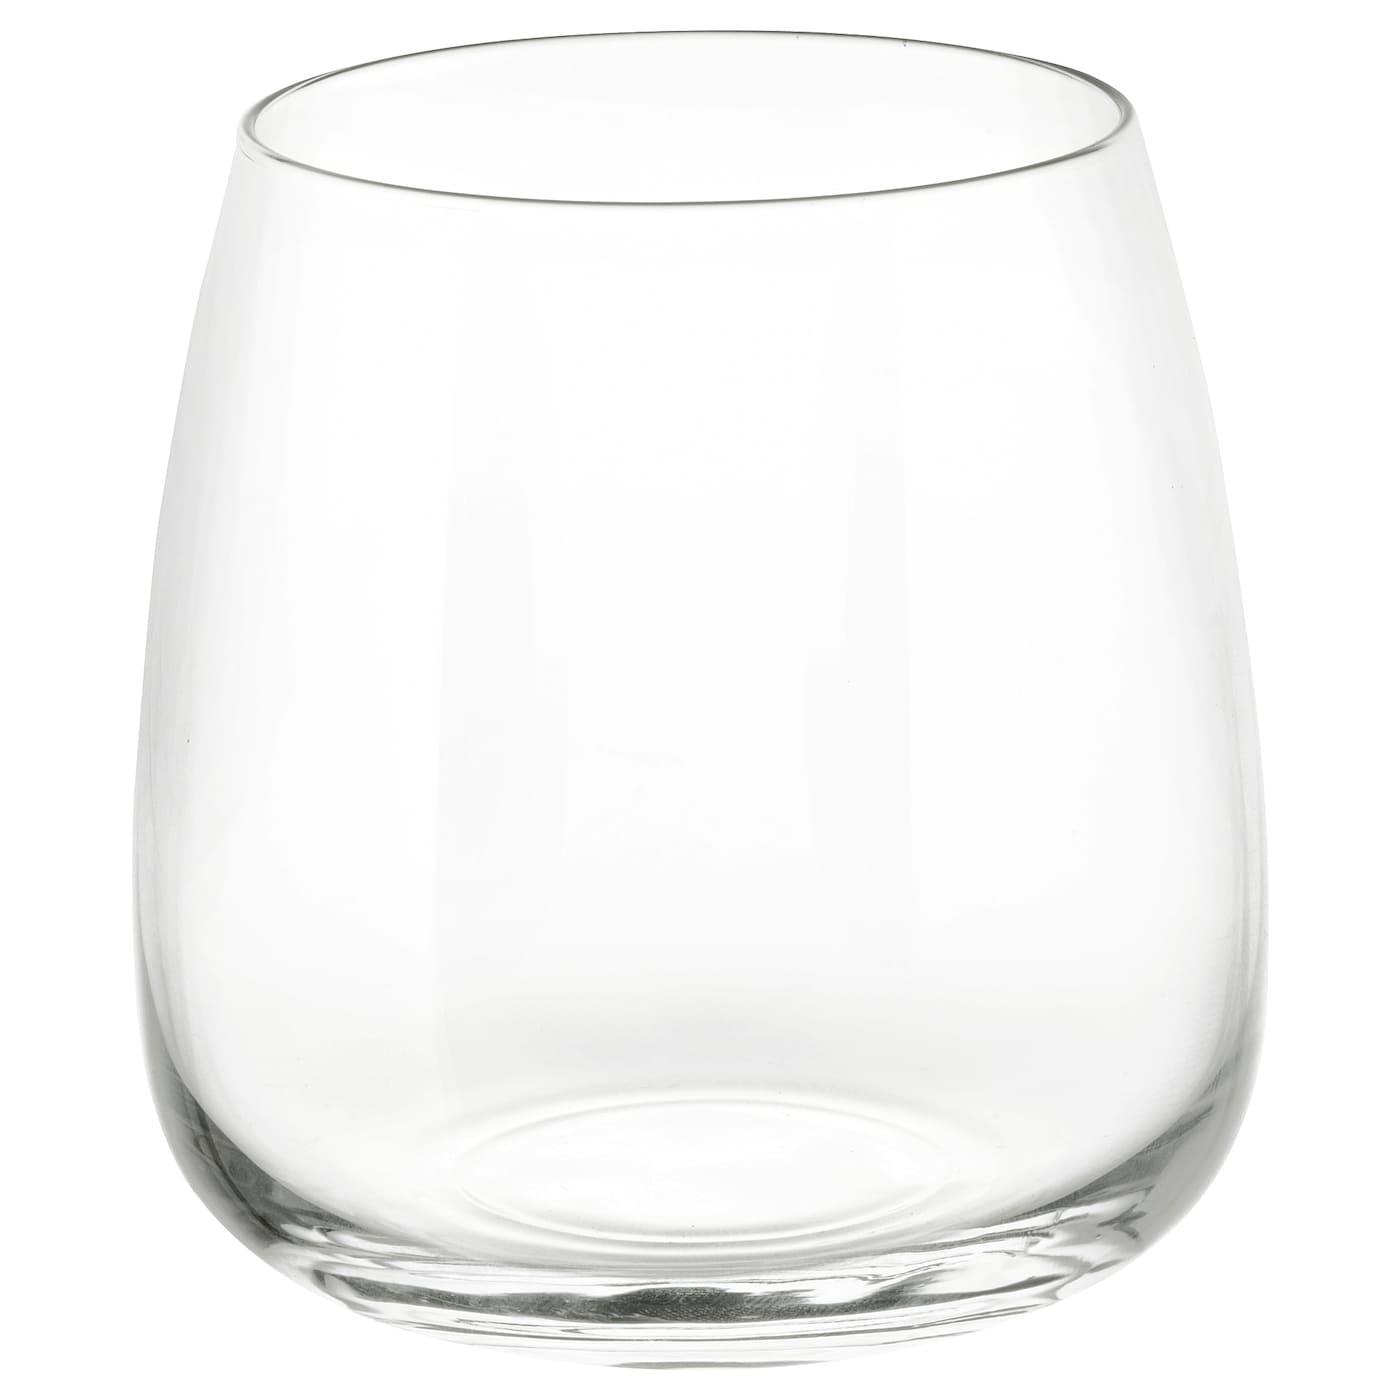 DYRGRIP Glass, clear glass, 36 cl - IKEA